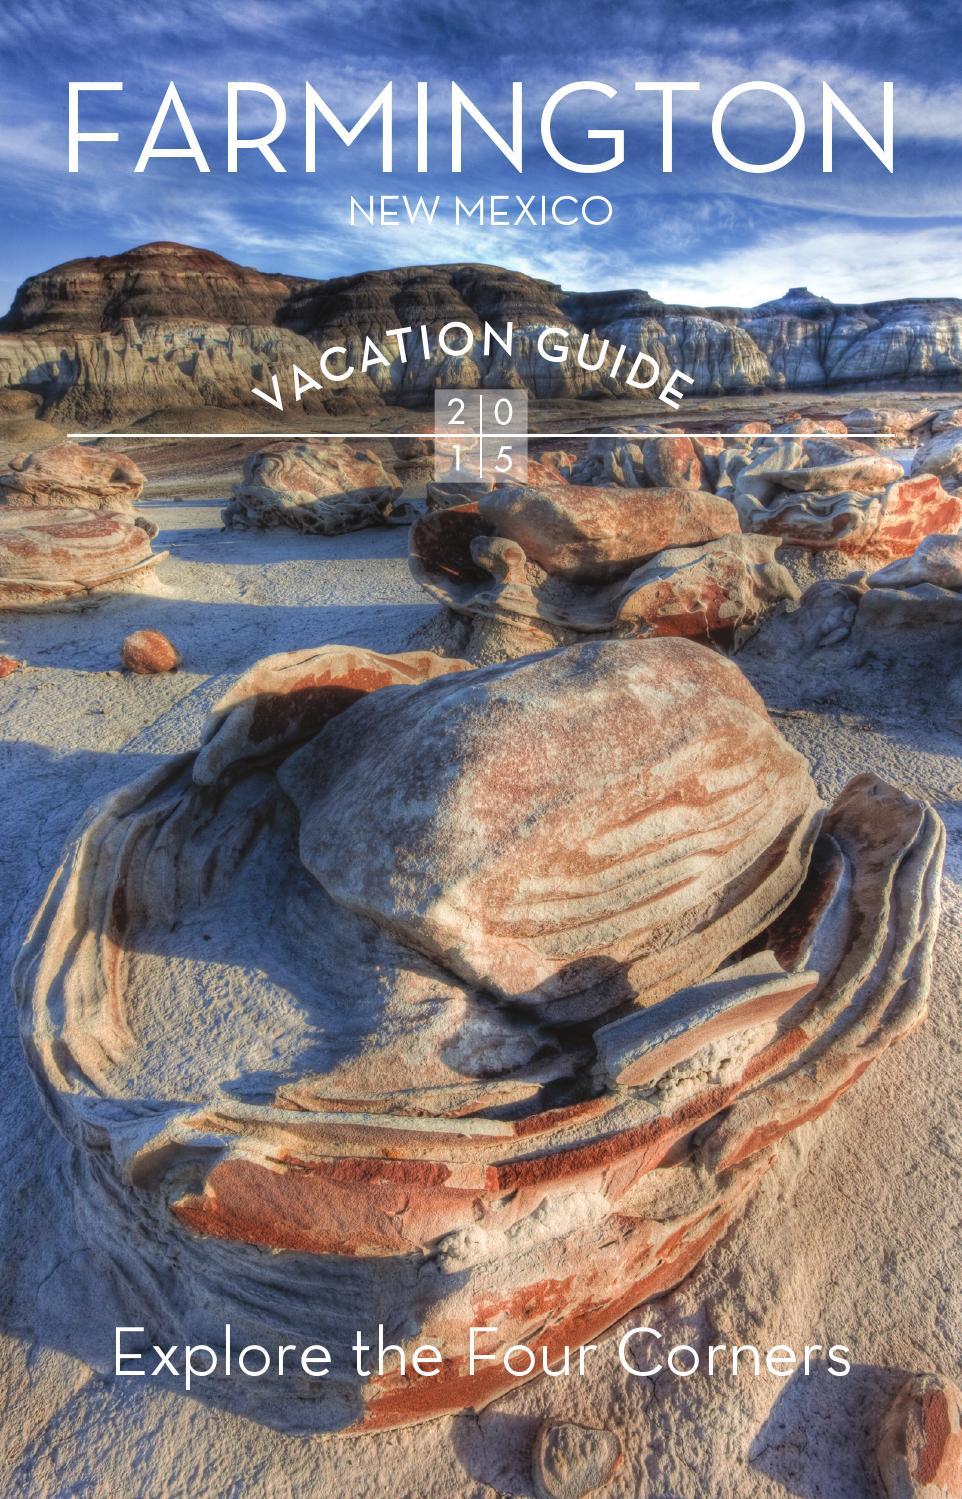 Farmington New Mexico 2015 Vacation Guide By Hawk Media